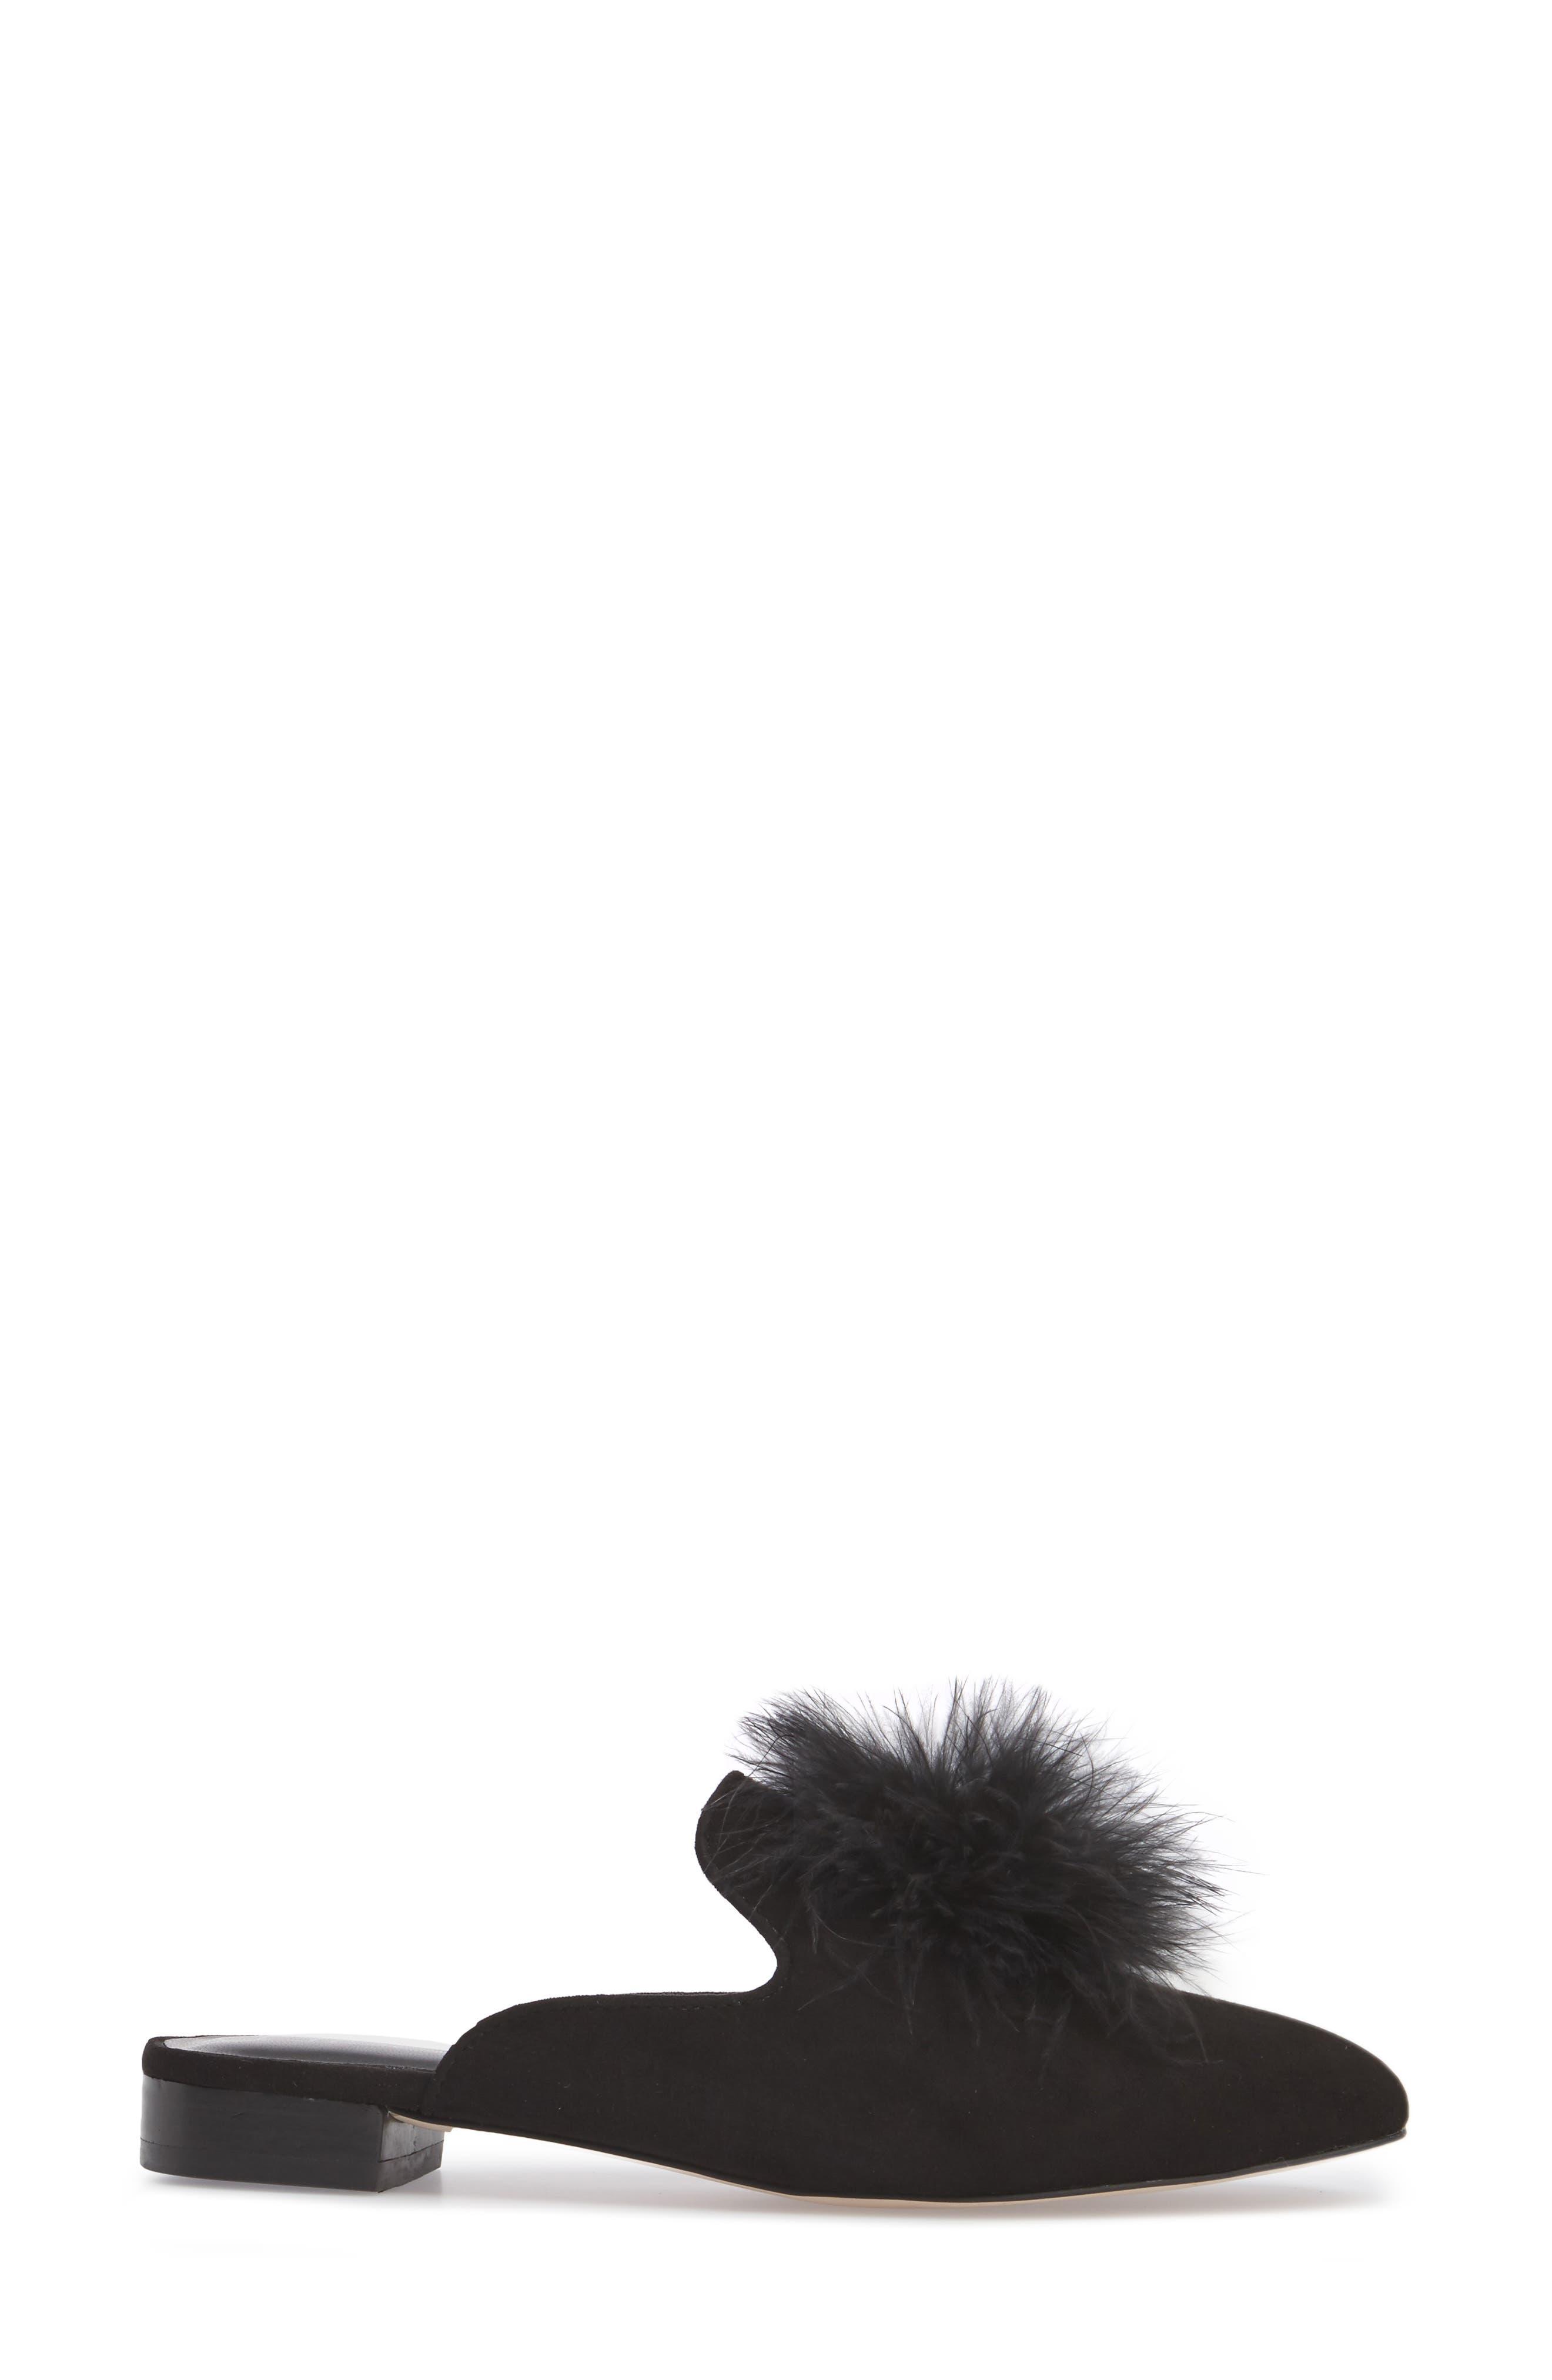 Alternate Image 3  - Sole Society Cleona Feather Pompom Mule (Women)